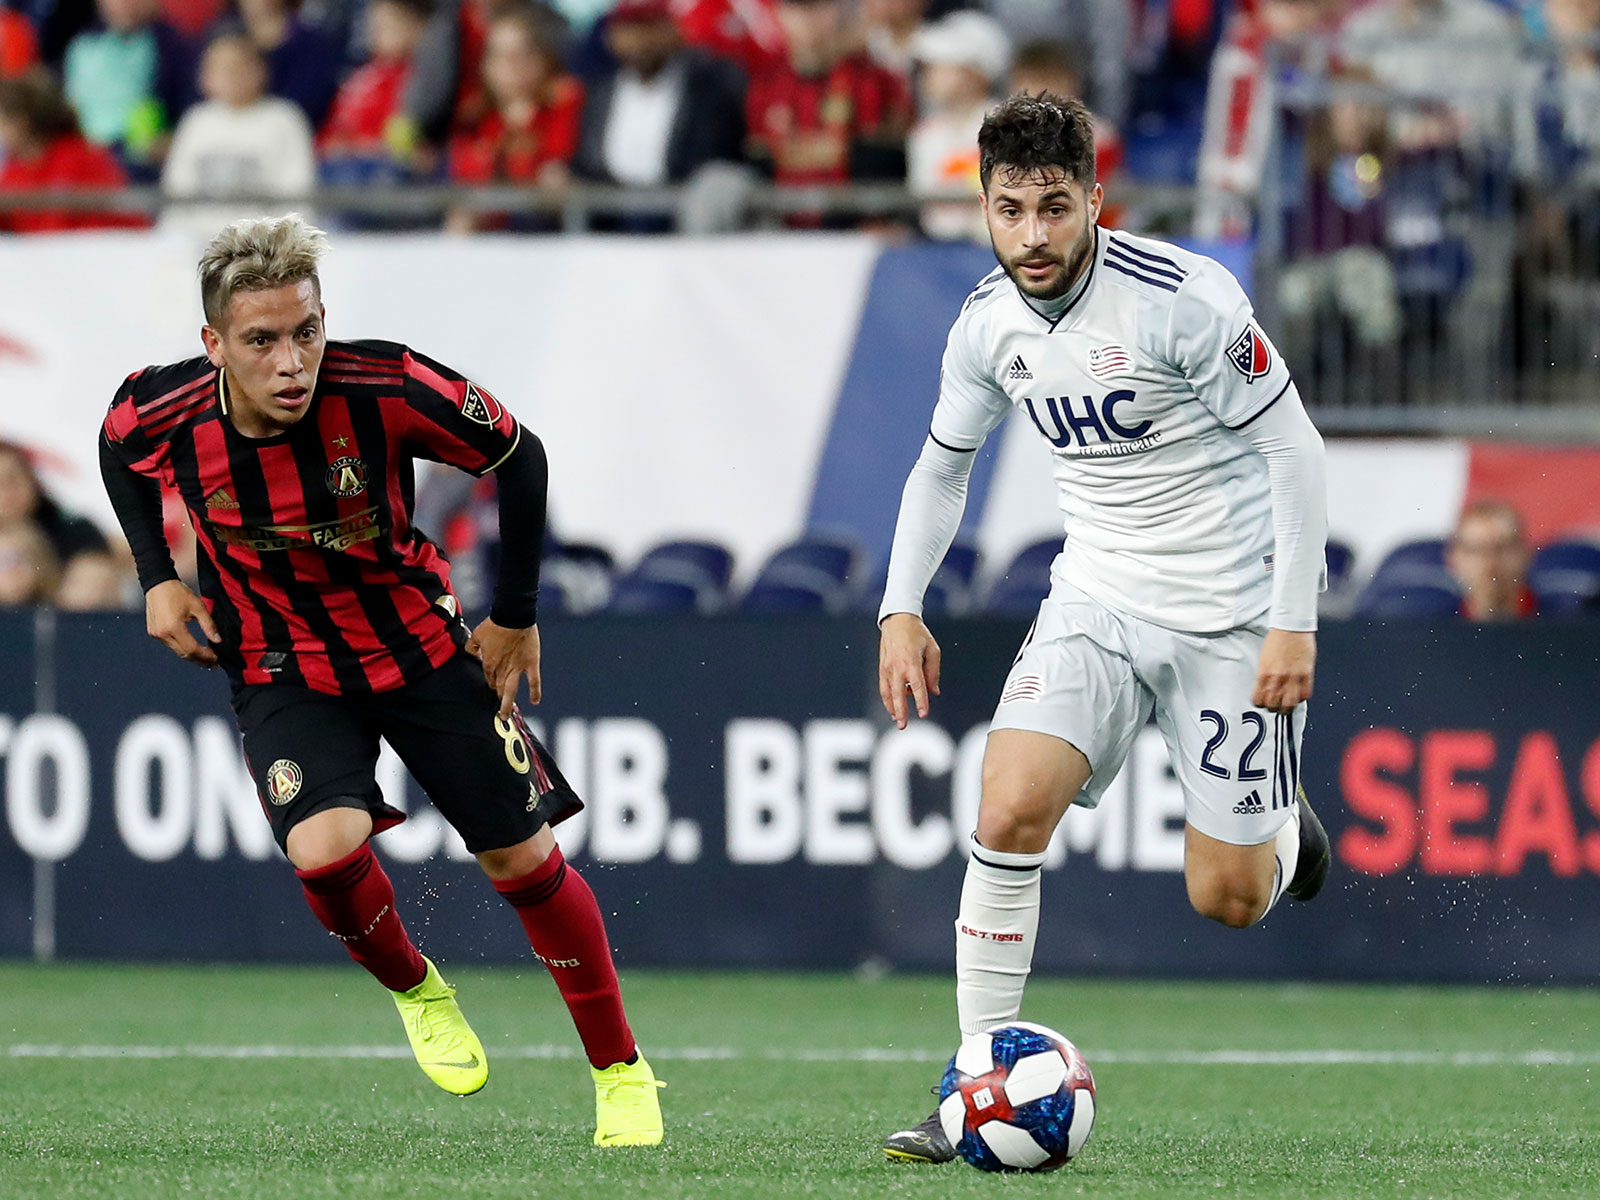 Atlanta United faces the New England Revolution